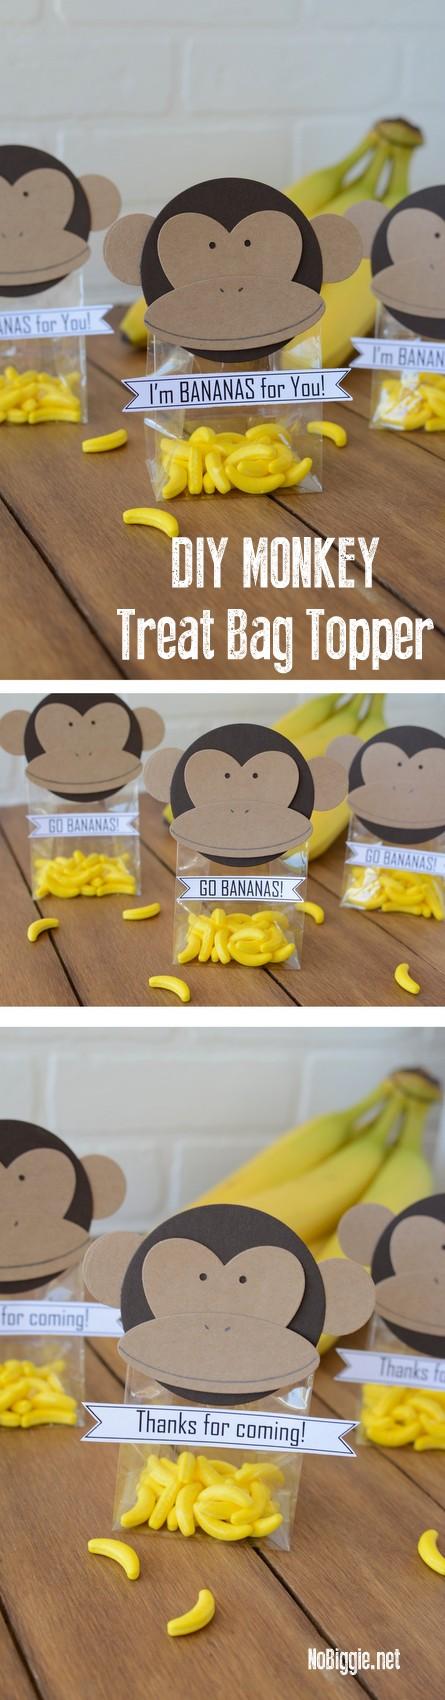 DIY monkey treat bag toppers | NoBiggie.net